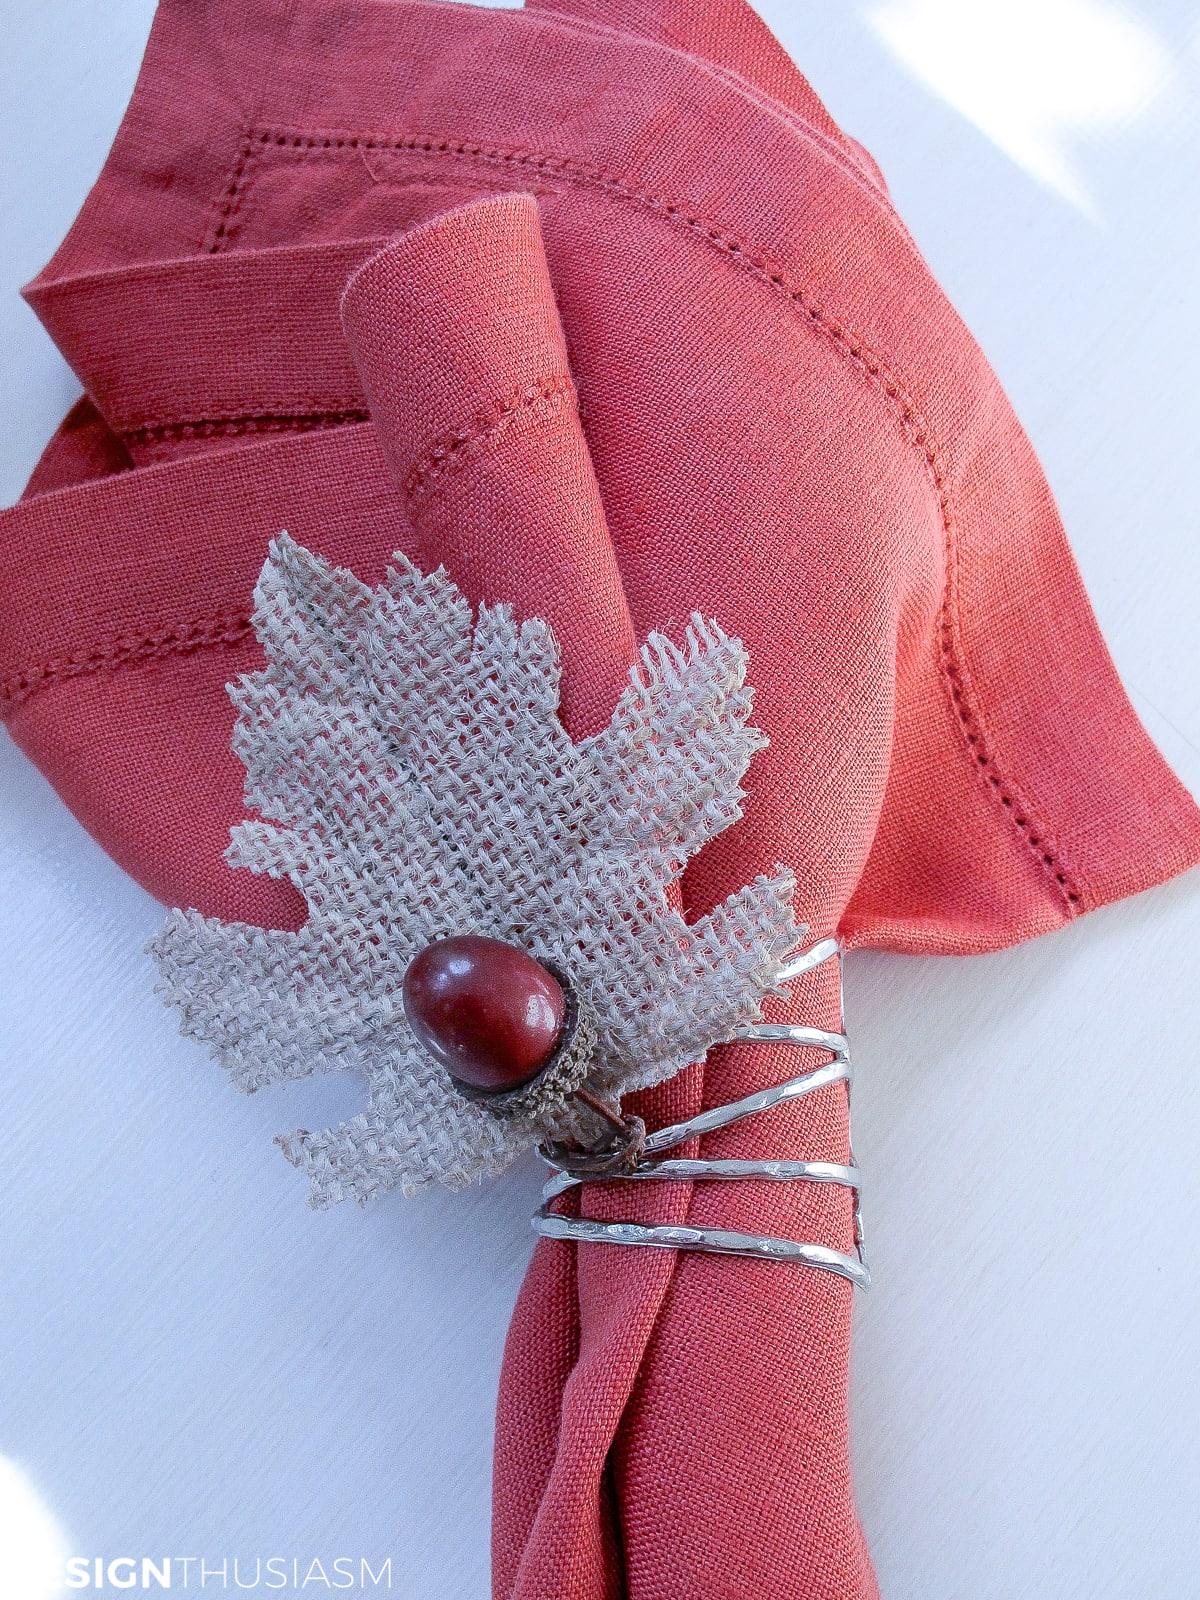 DIY fall napkin rings with acorns and burlap leaves